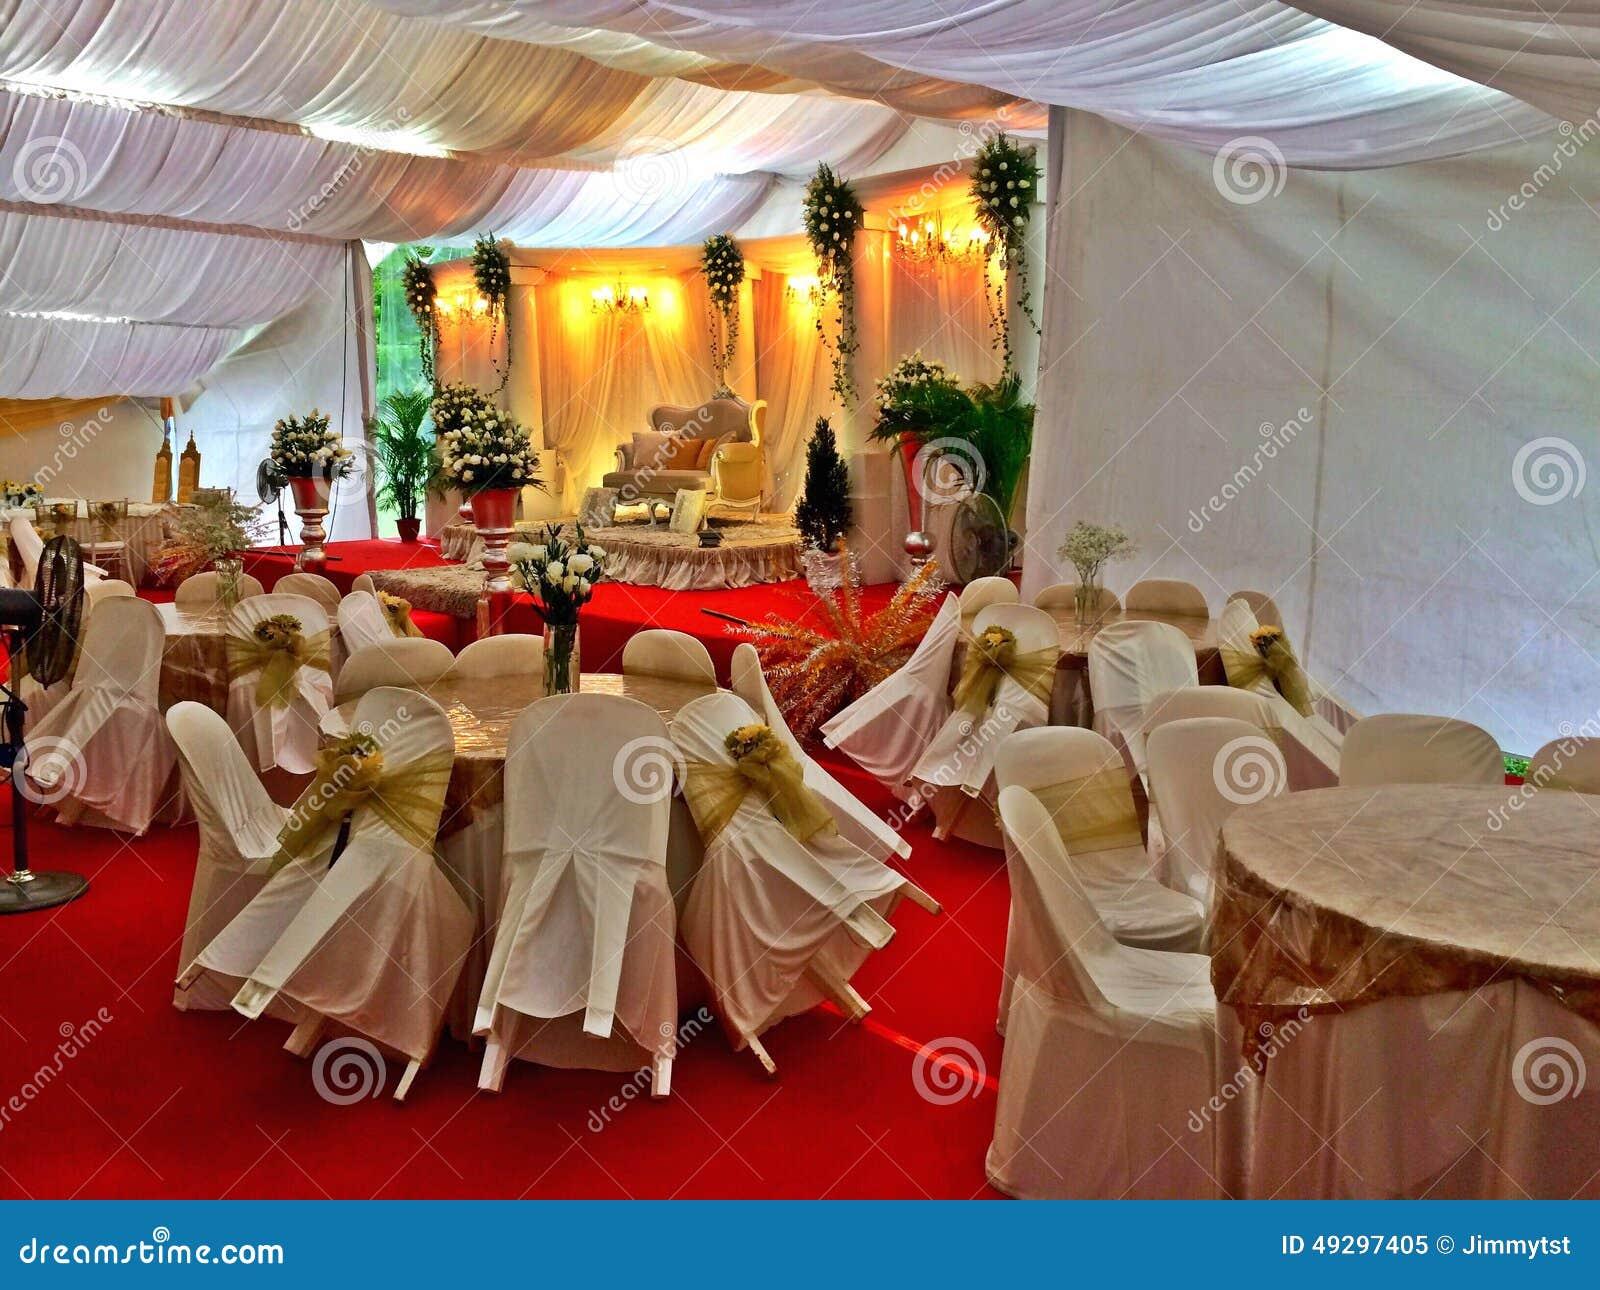 Malay Wedding Decor In Singapore Editorial Image Image Of